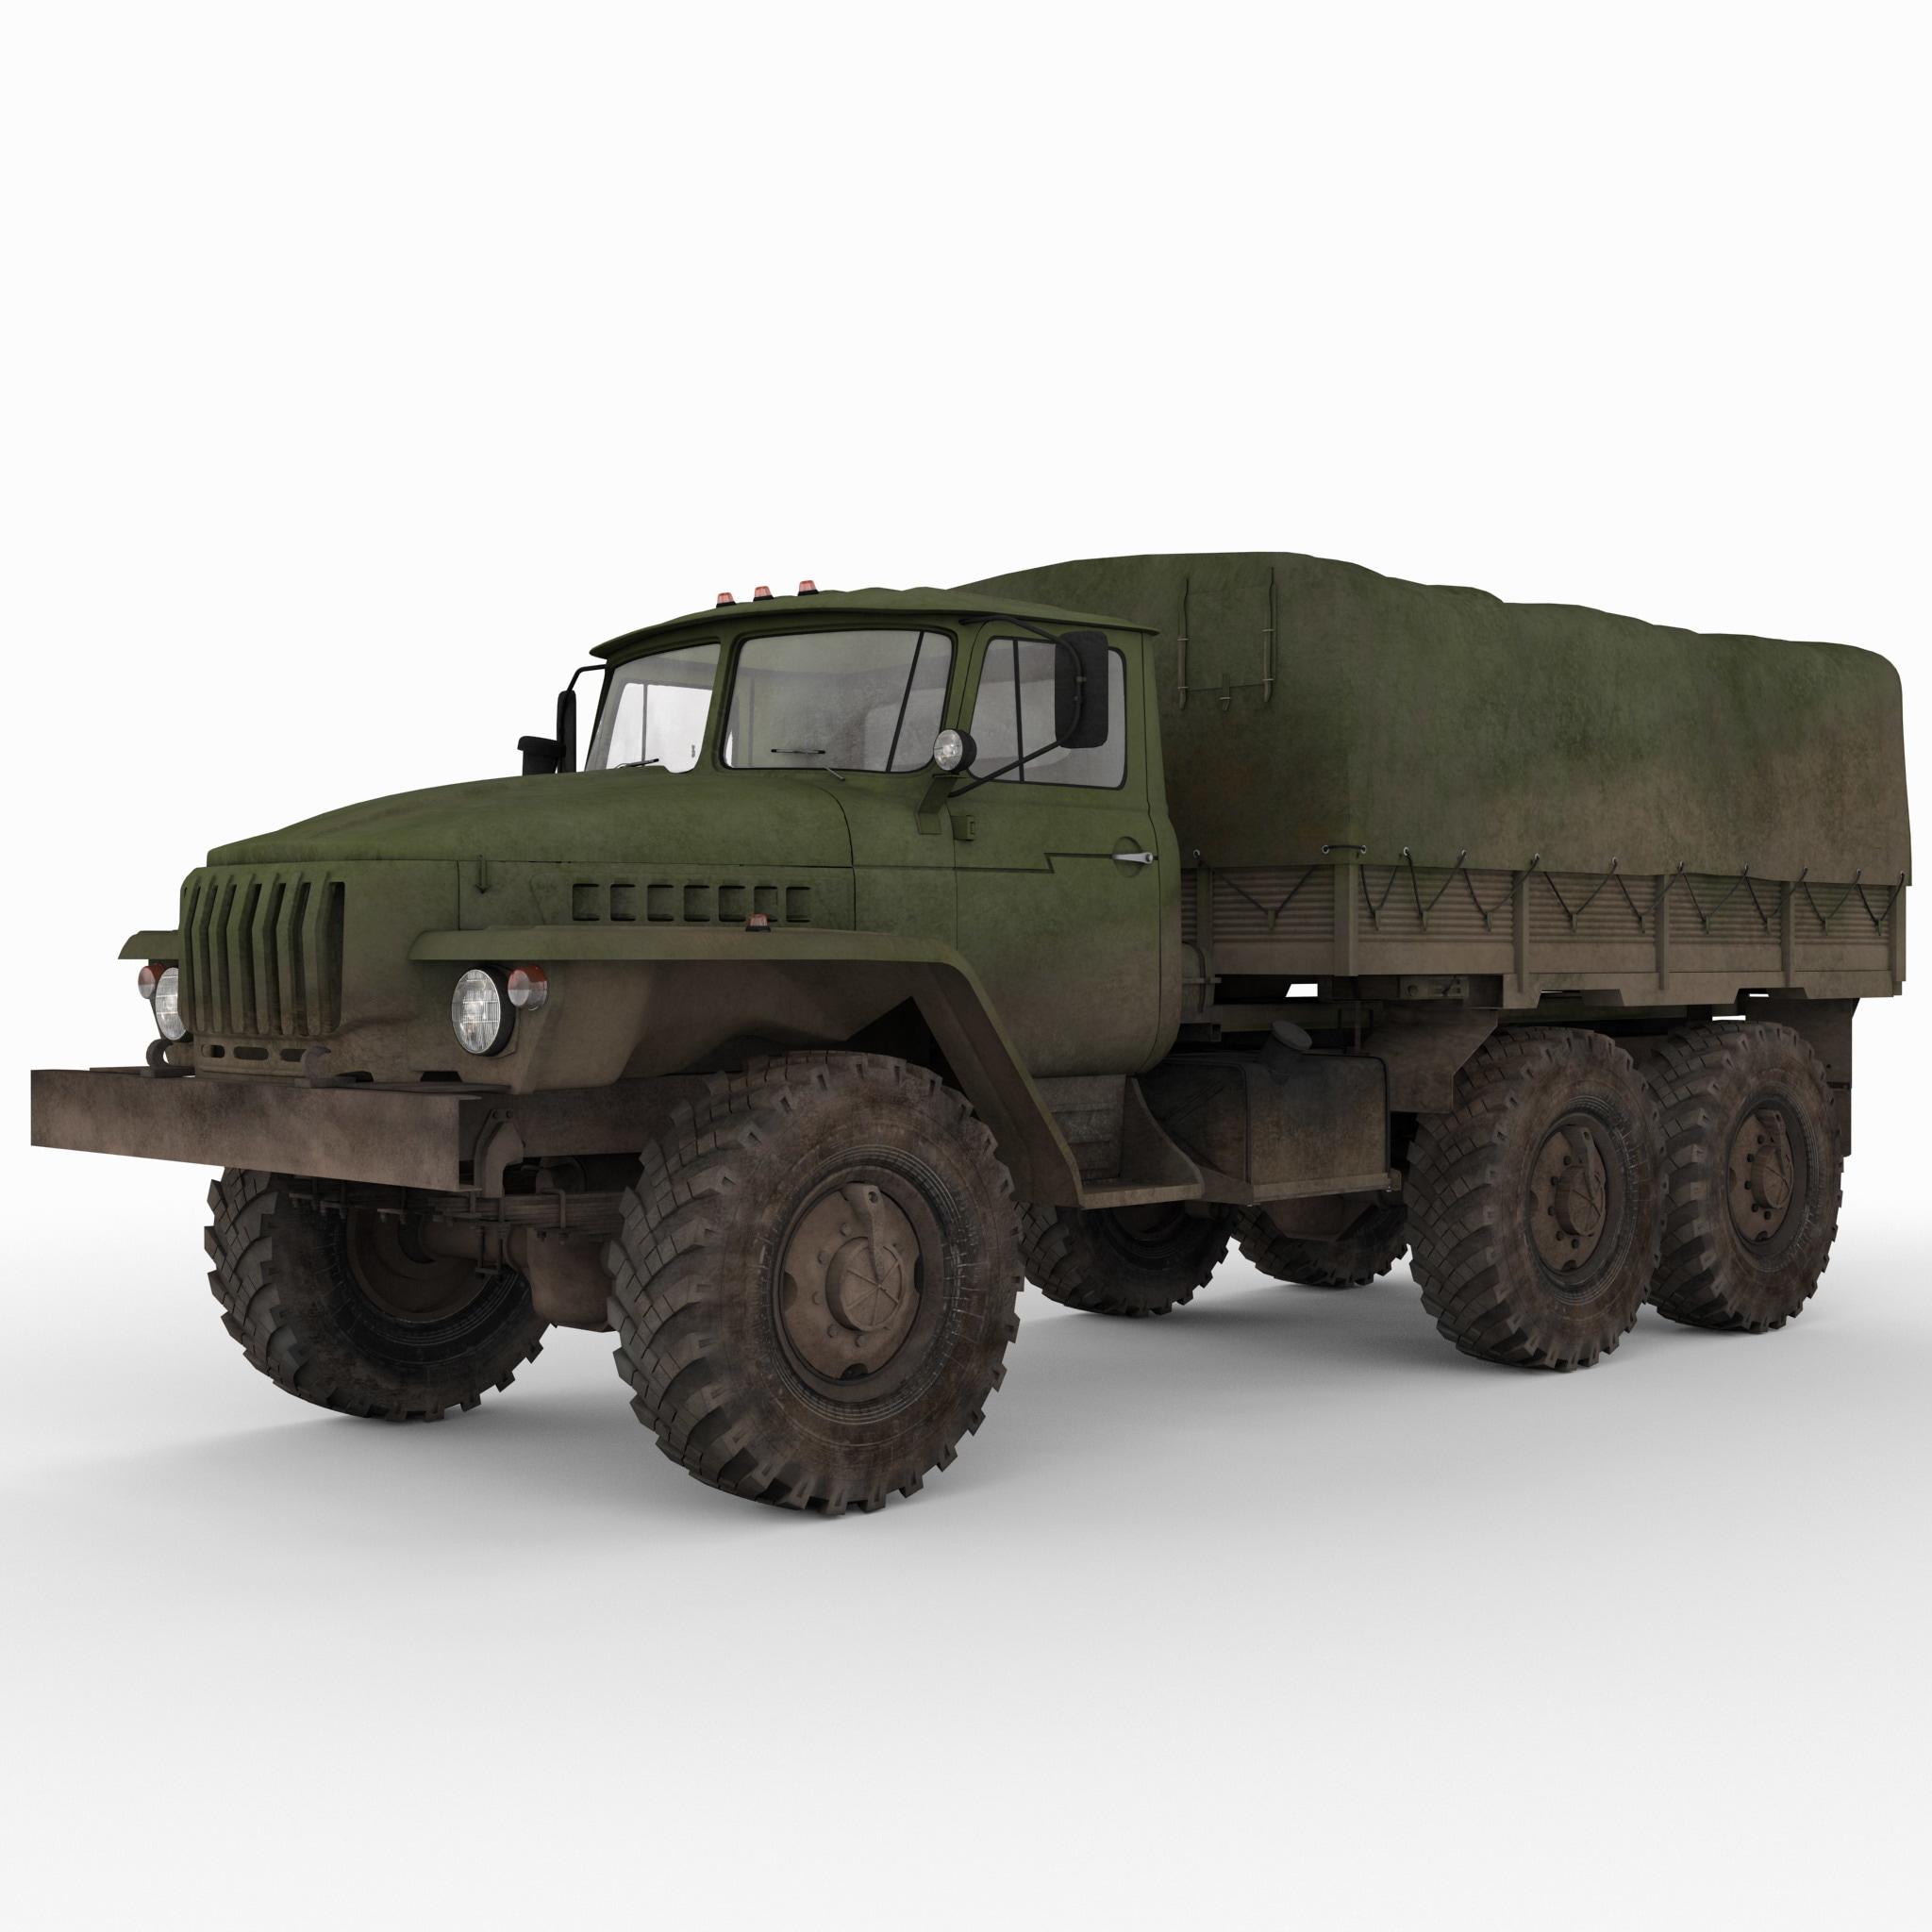 Russian Army 6x6 Truck Ural 4320